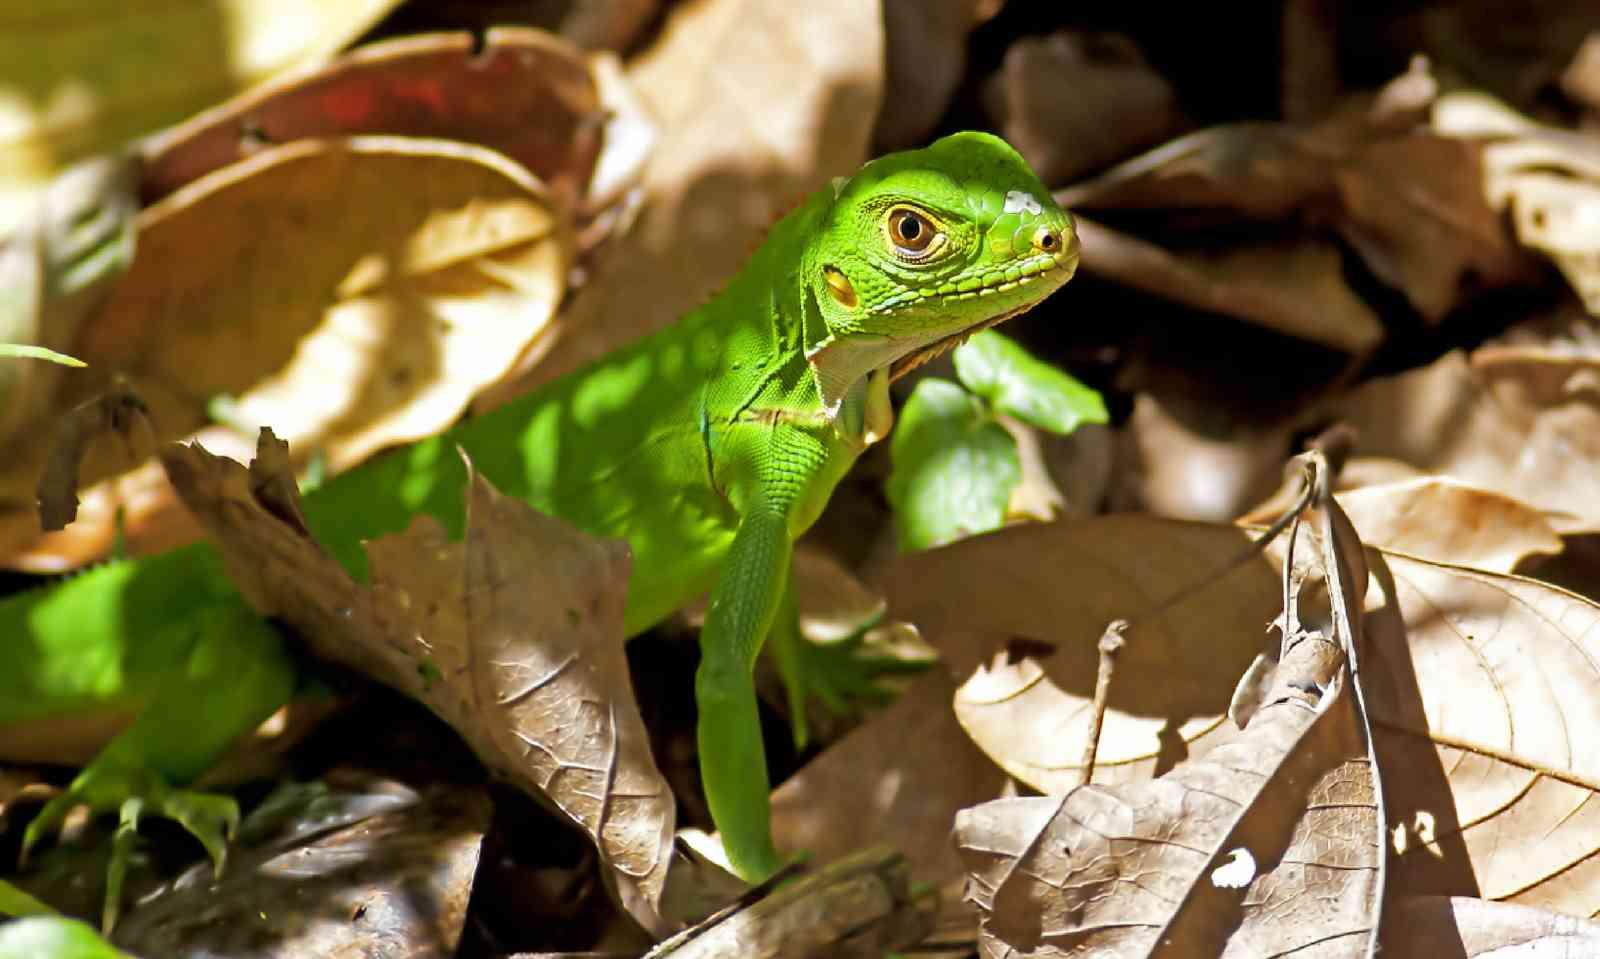 Juvenile green Iguana in Manuel Antonio National Park (Shutterstock)